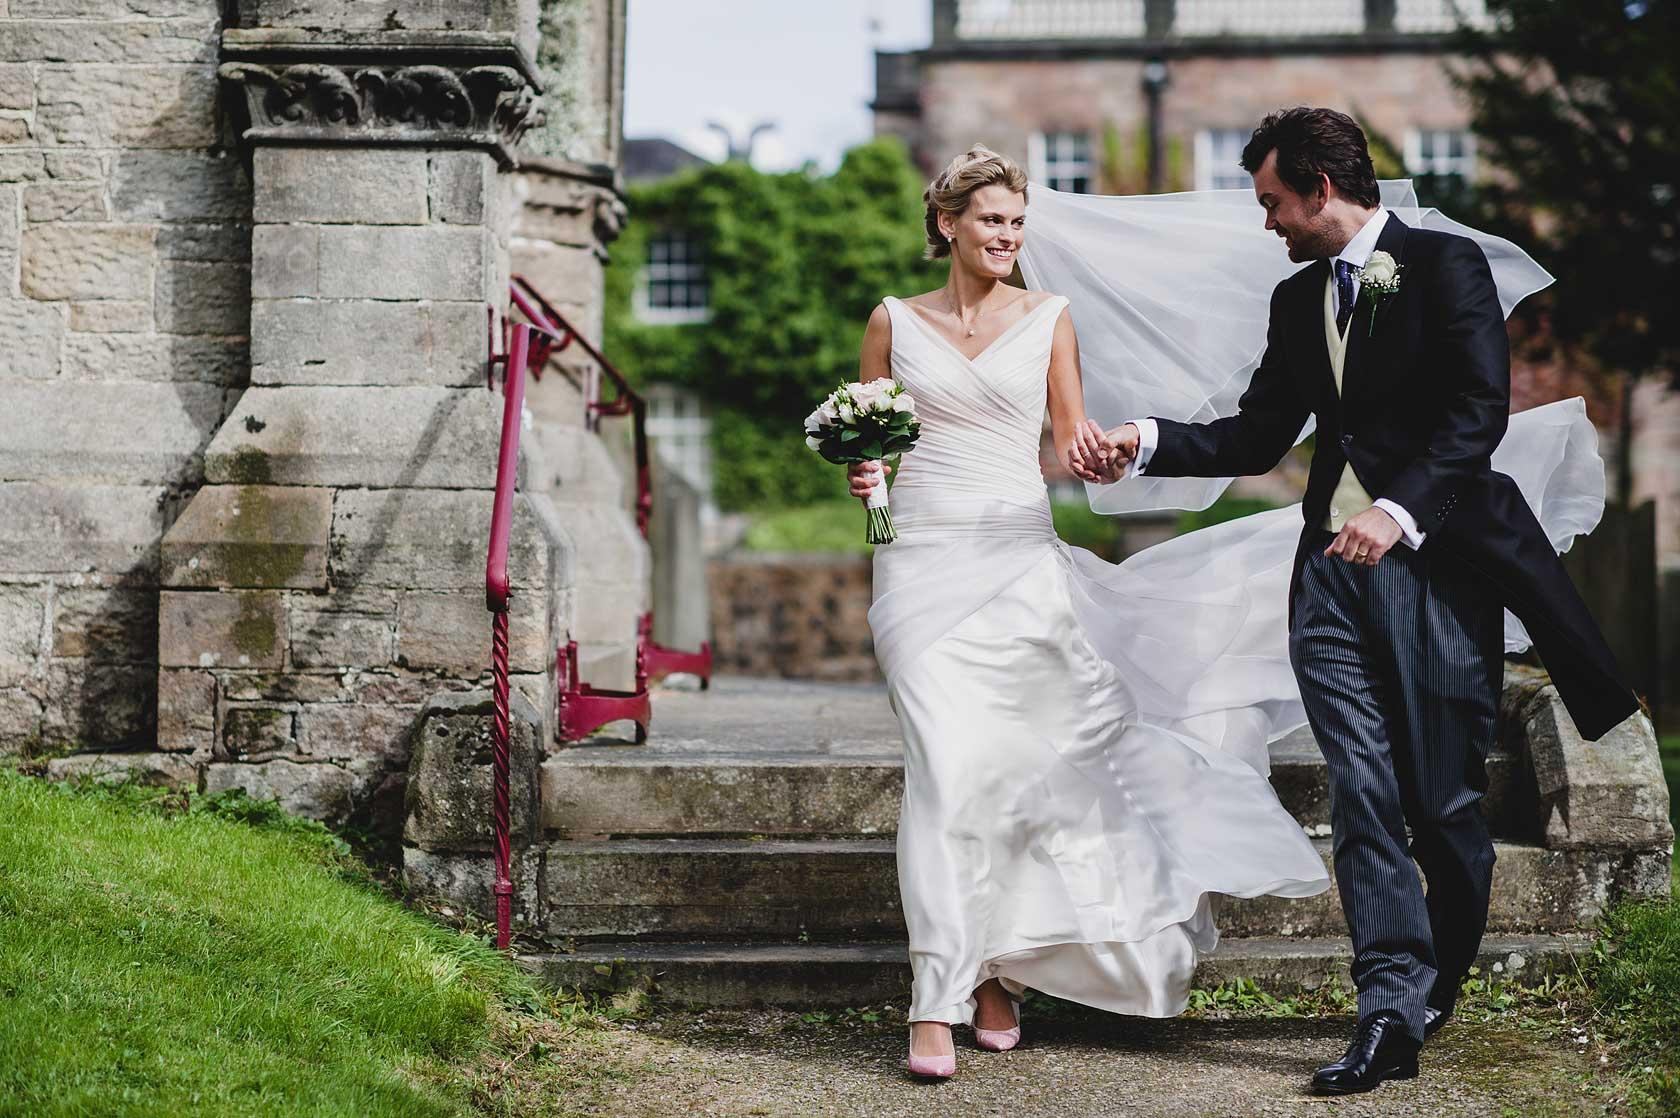 Reportage Wedding Photography in Harrogate